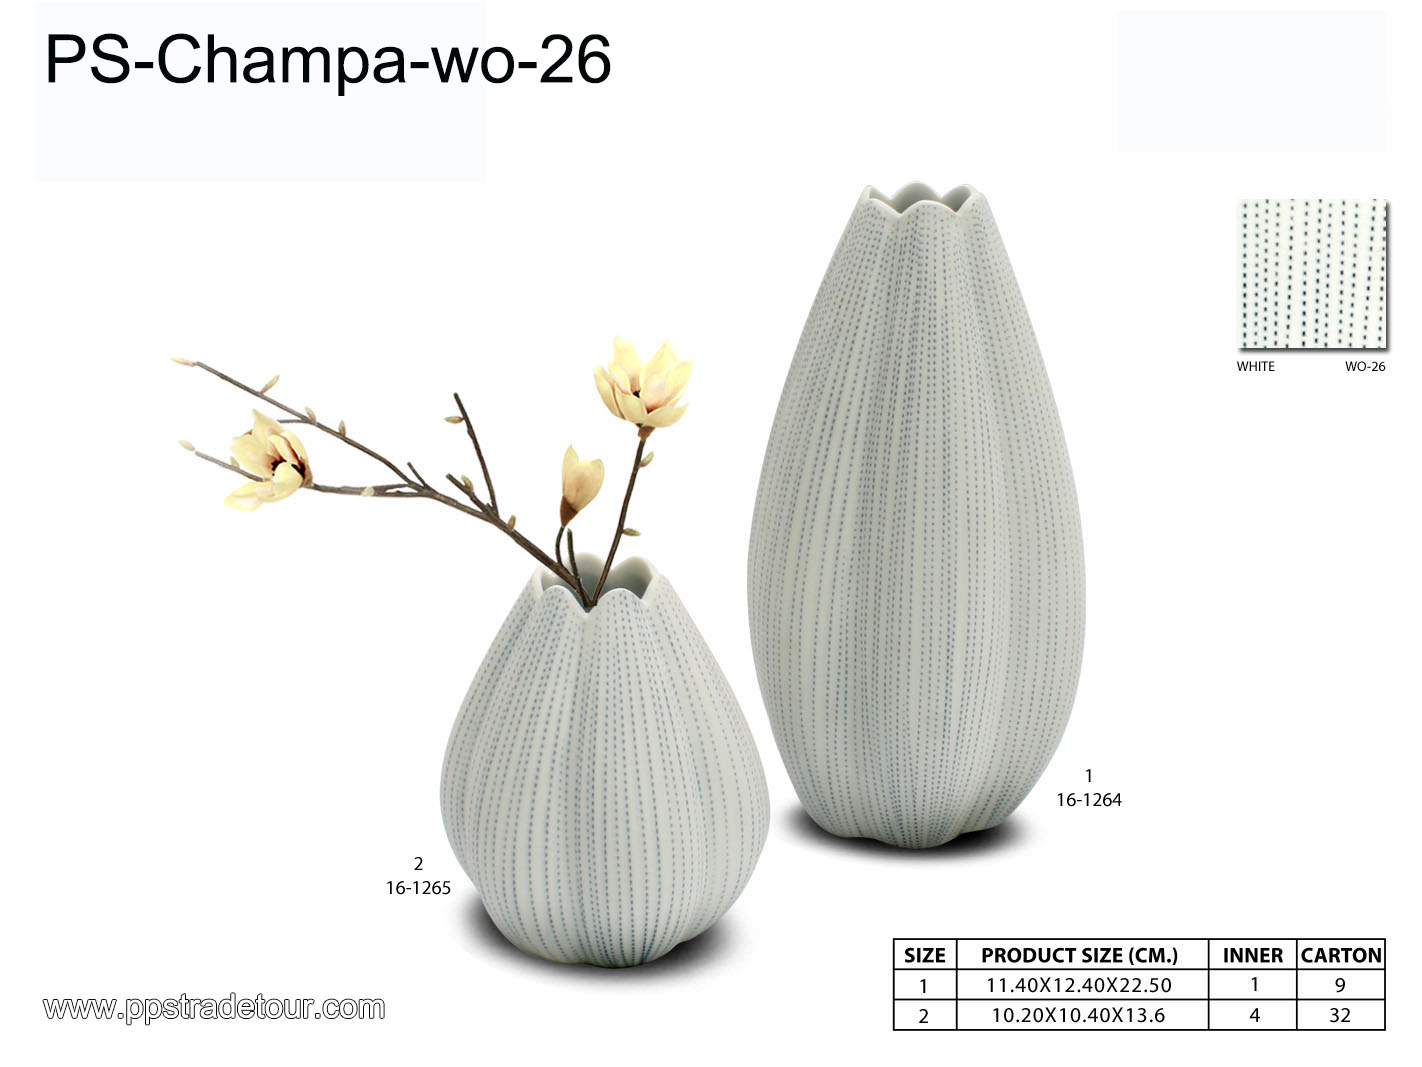 PSCV-Champa-wo-26